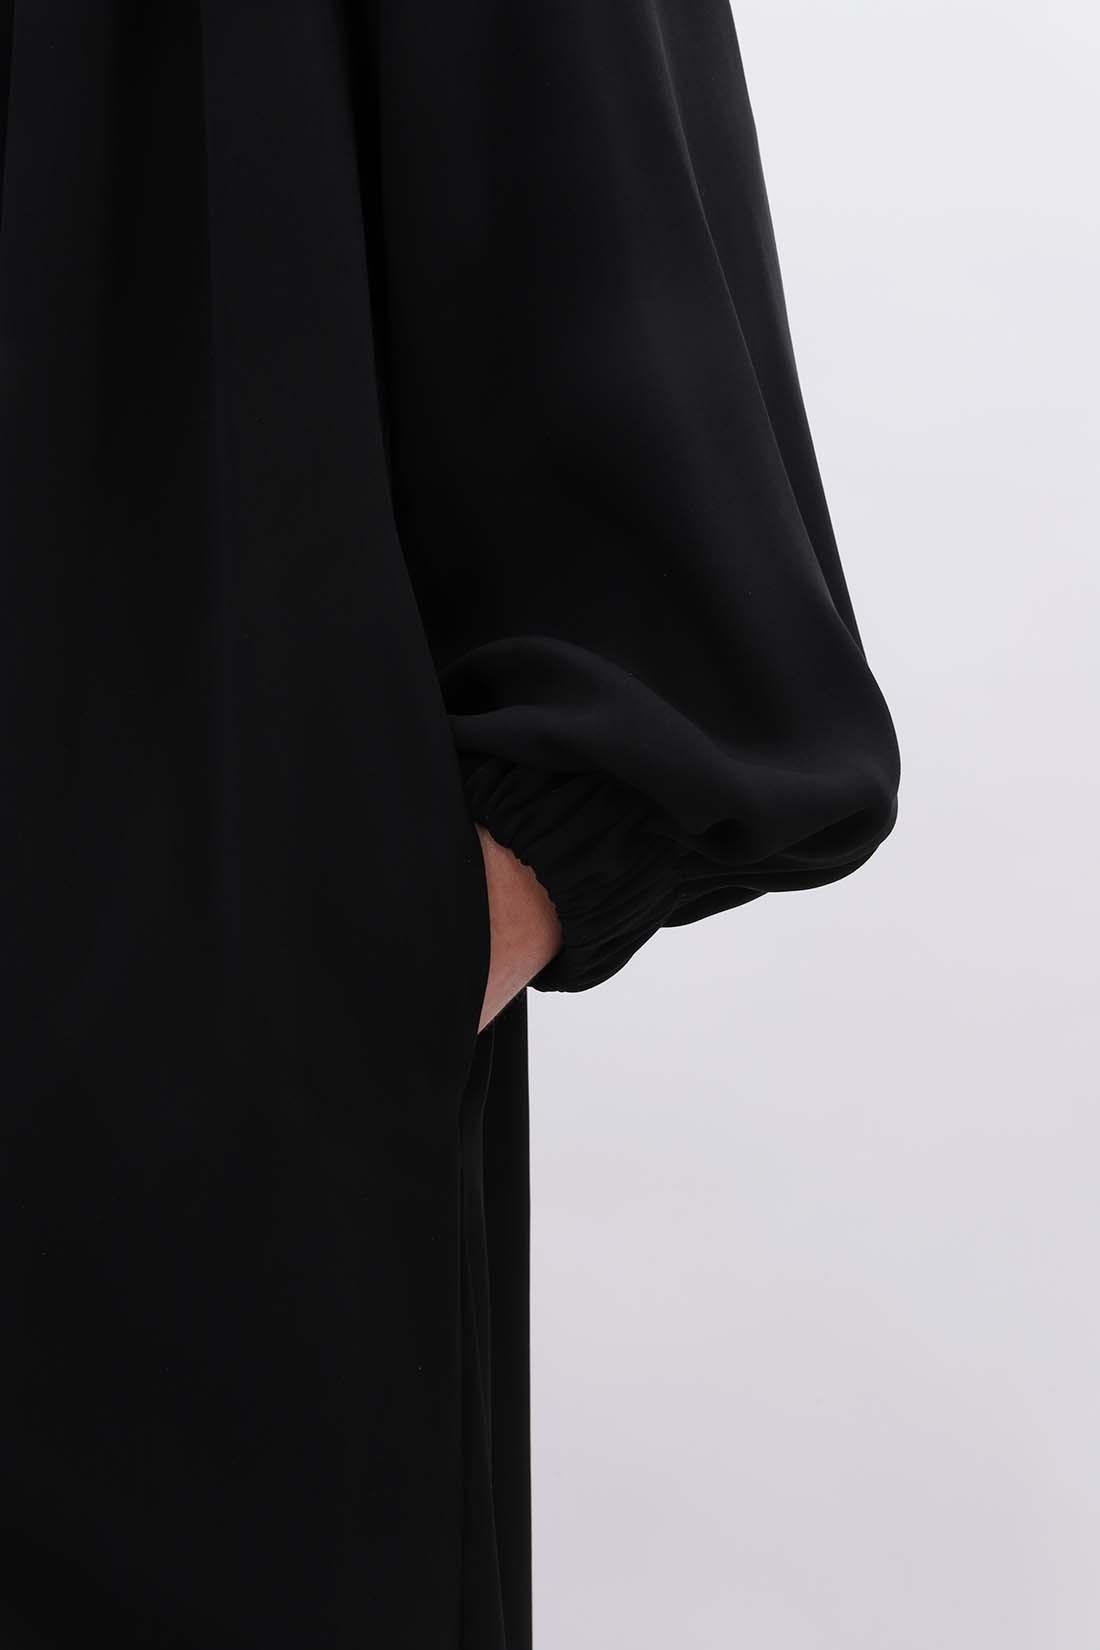 MM6 MAISON MARGIELA FOR WOMAN / Elastic fluid dress Black